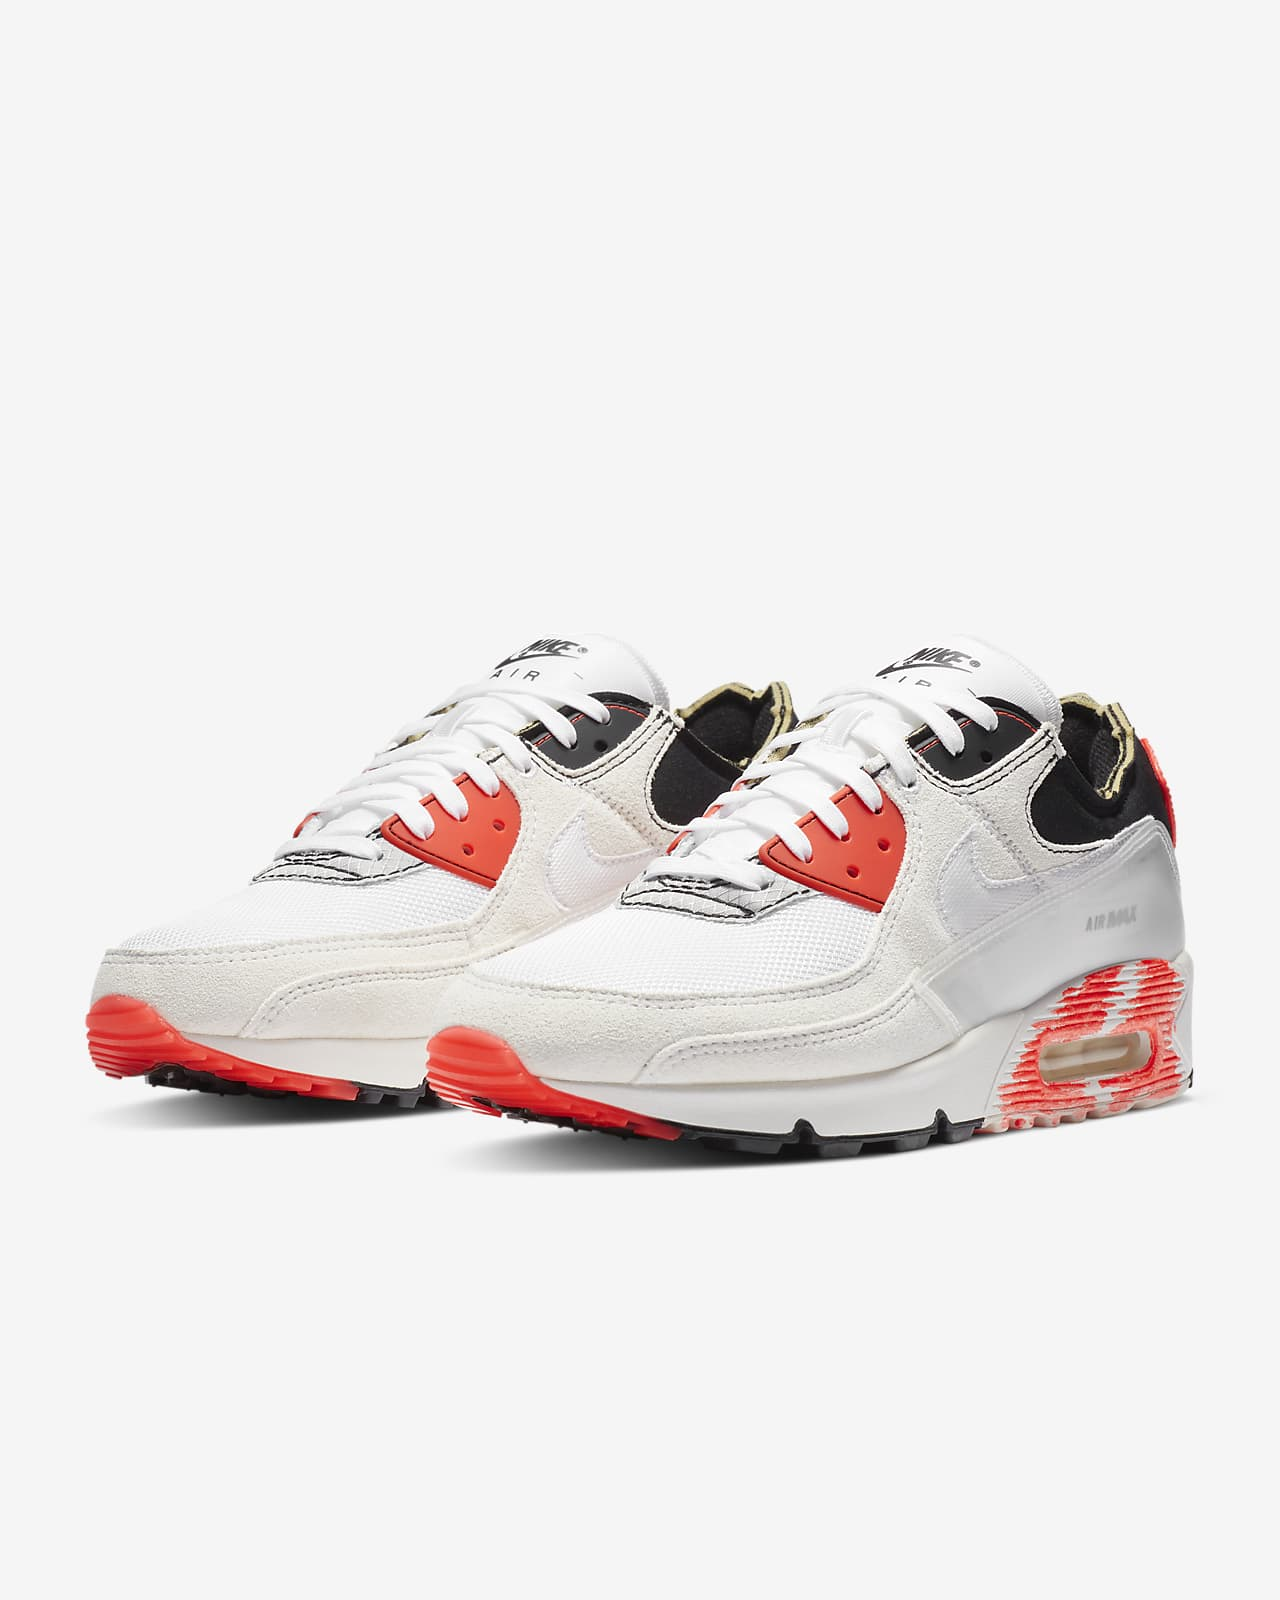 Acercarse Elemental caliente  Nike Air Max 90 Premium Men's Shoe. Nike.com